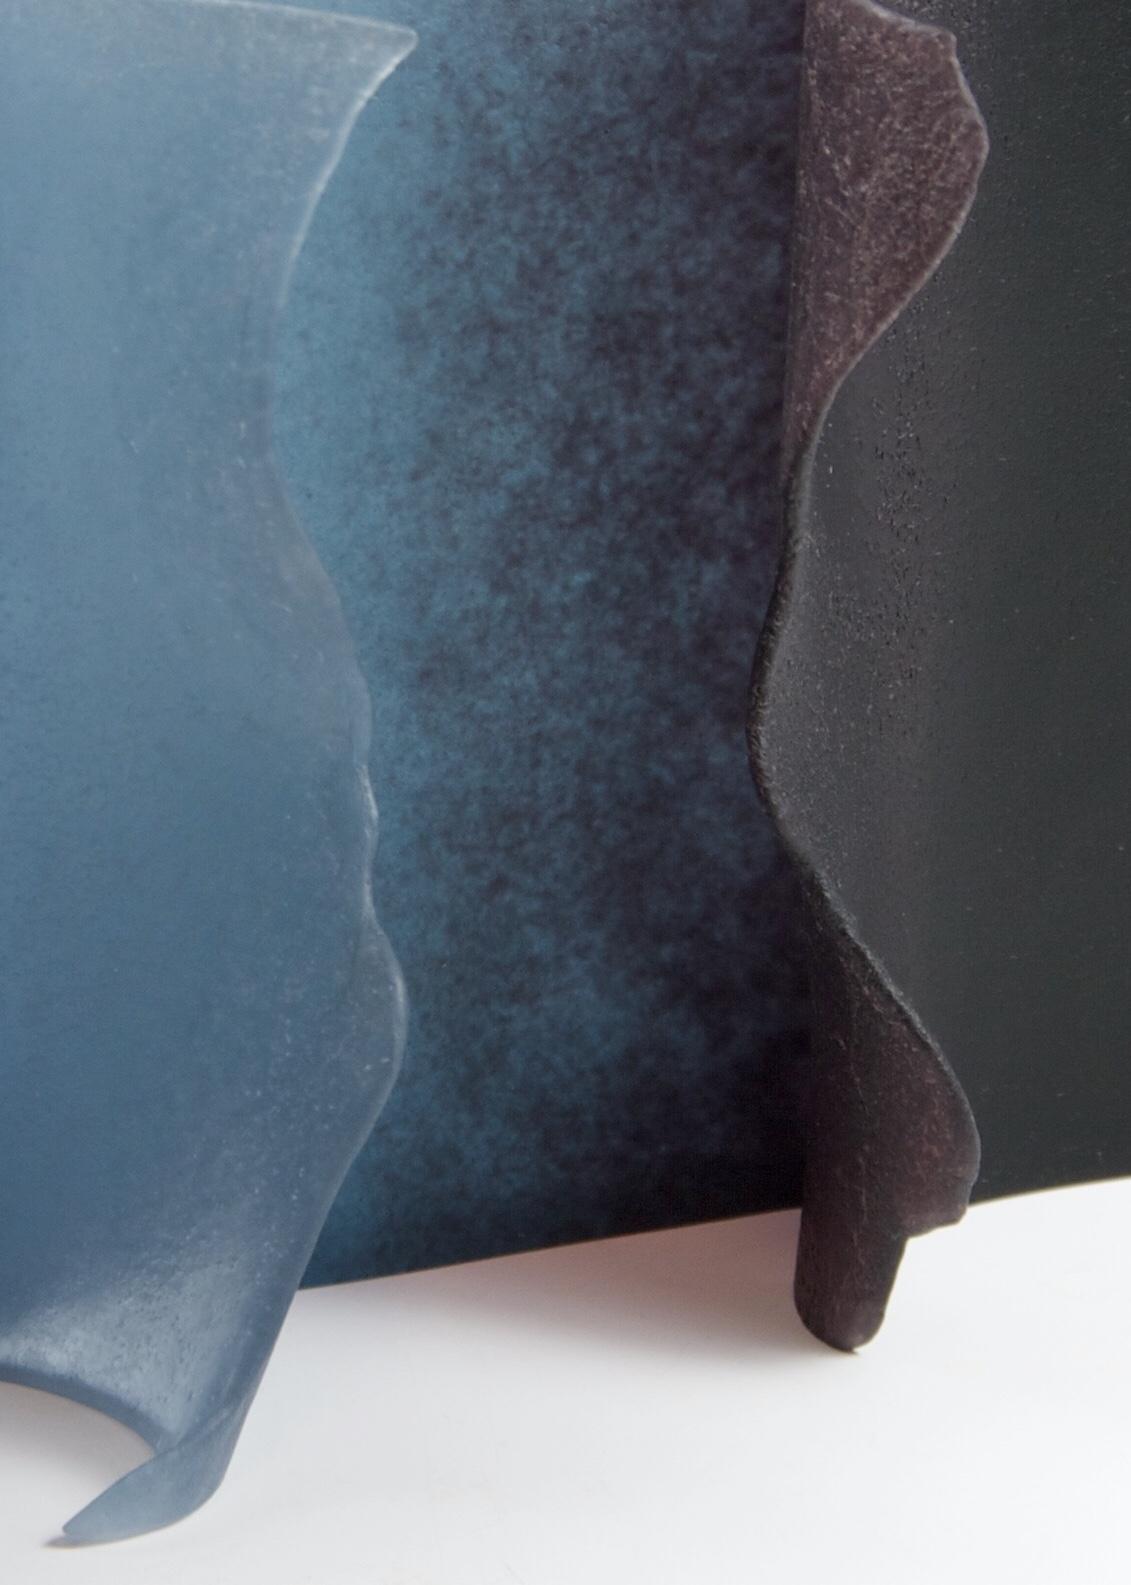 Donna Rice,  Violet Tear , 2018. Glass, lost wax, kiln-cast pate de verre,8.25″ x 5.5″ x 1″. Photo: Donna Rice